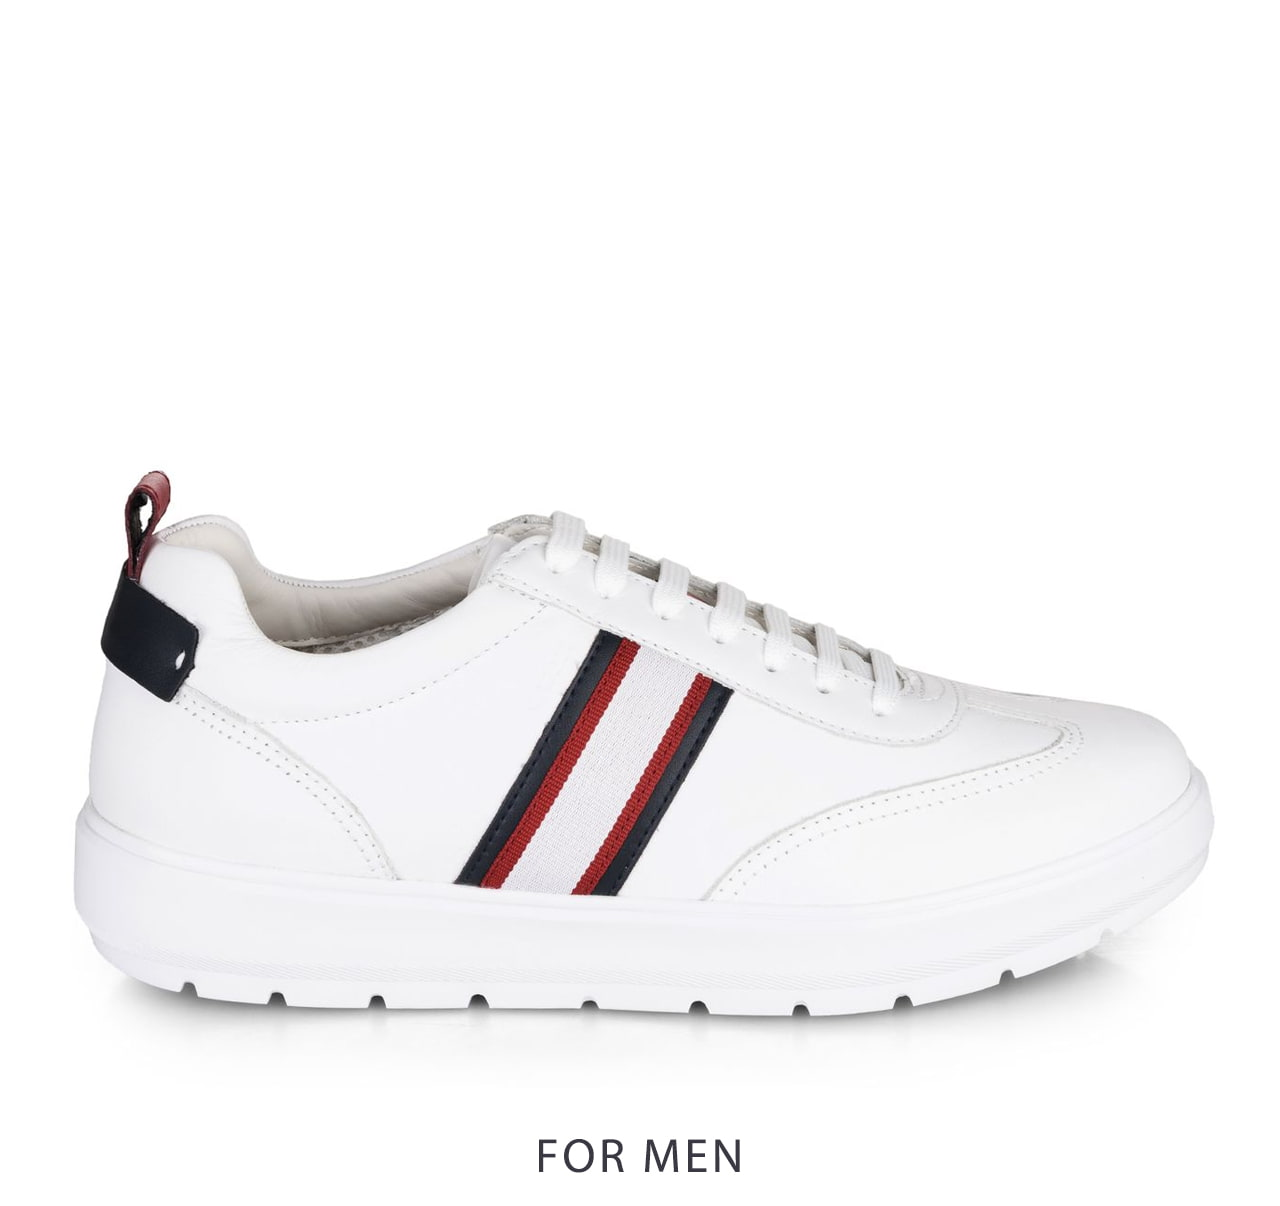 2b52c54a30c0 Παπούτσια, Ρούχα & Αξεσουάρ | sagiakos.gr